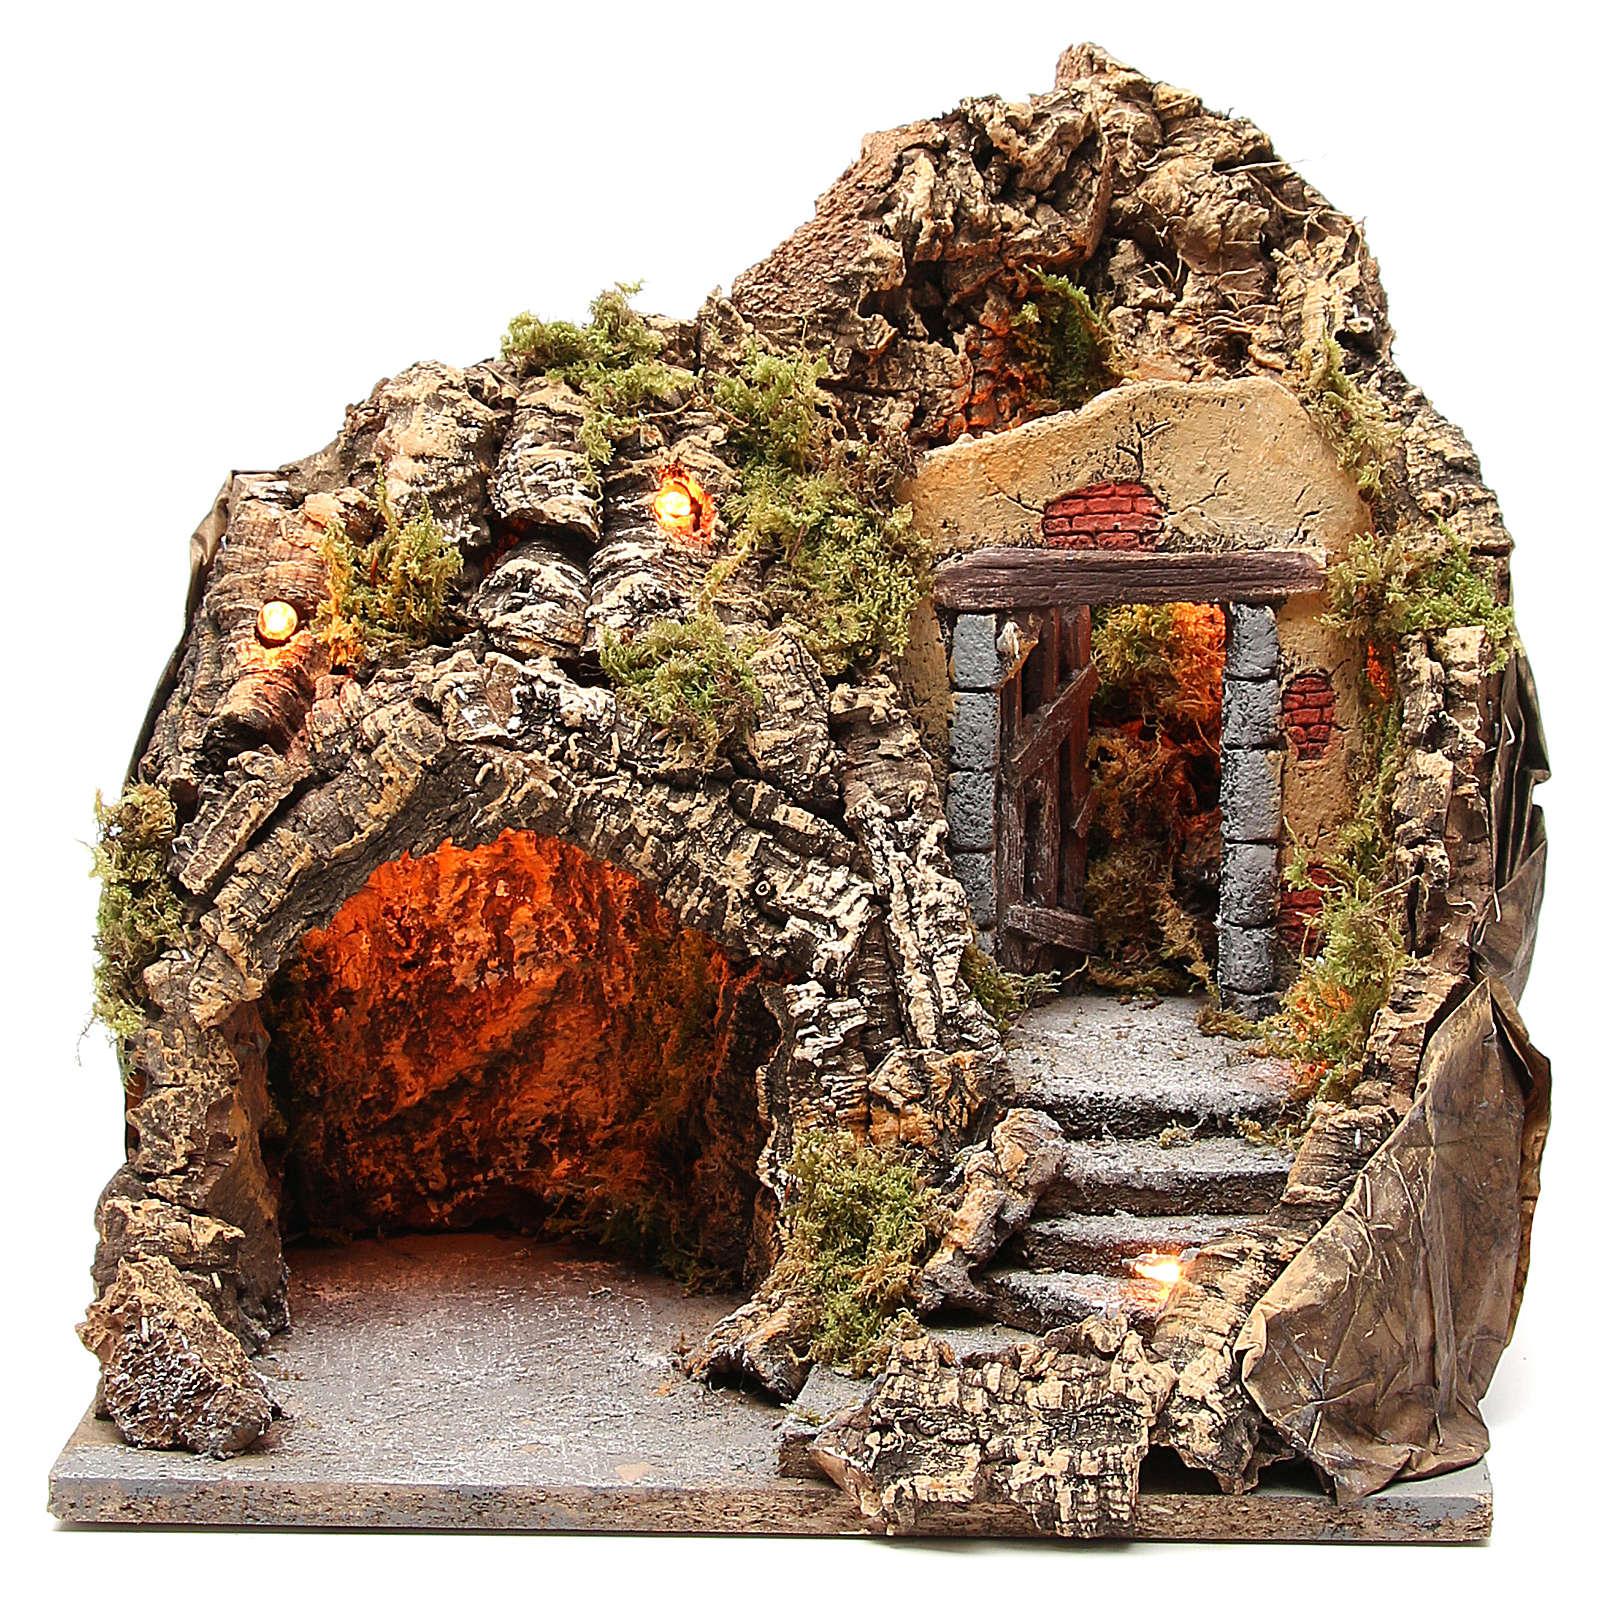 Illuminated grotto for Neapolitan Nativity scene, 38x30x30cm 4